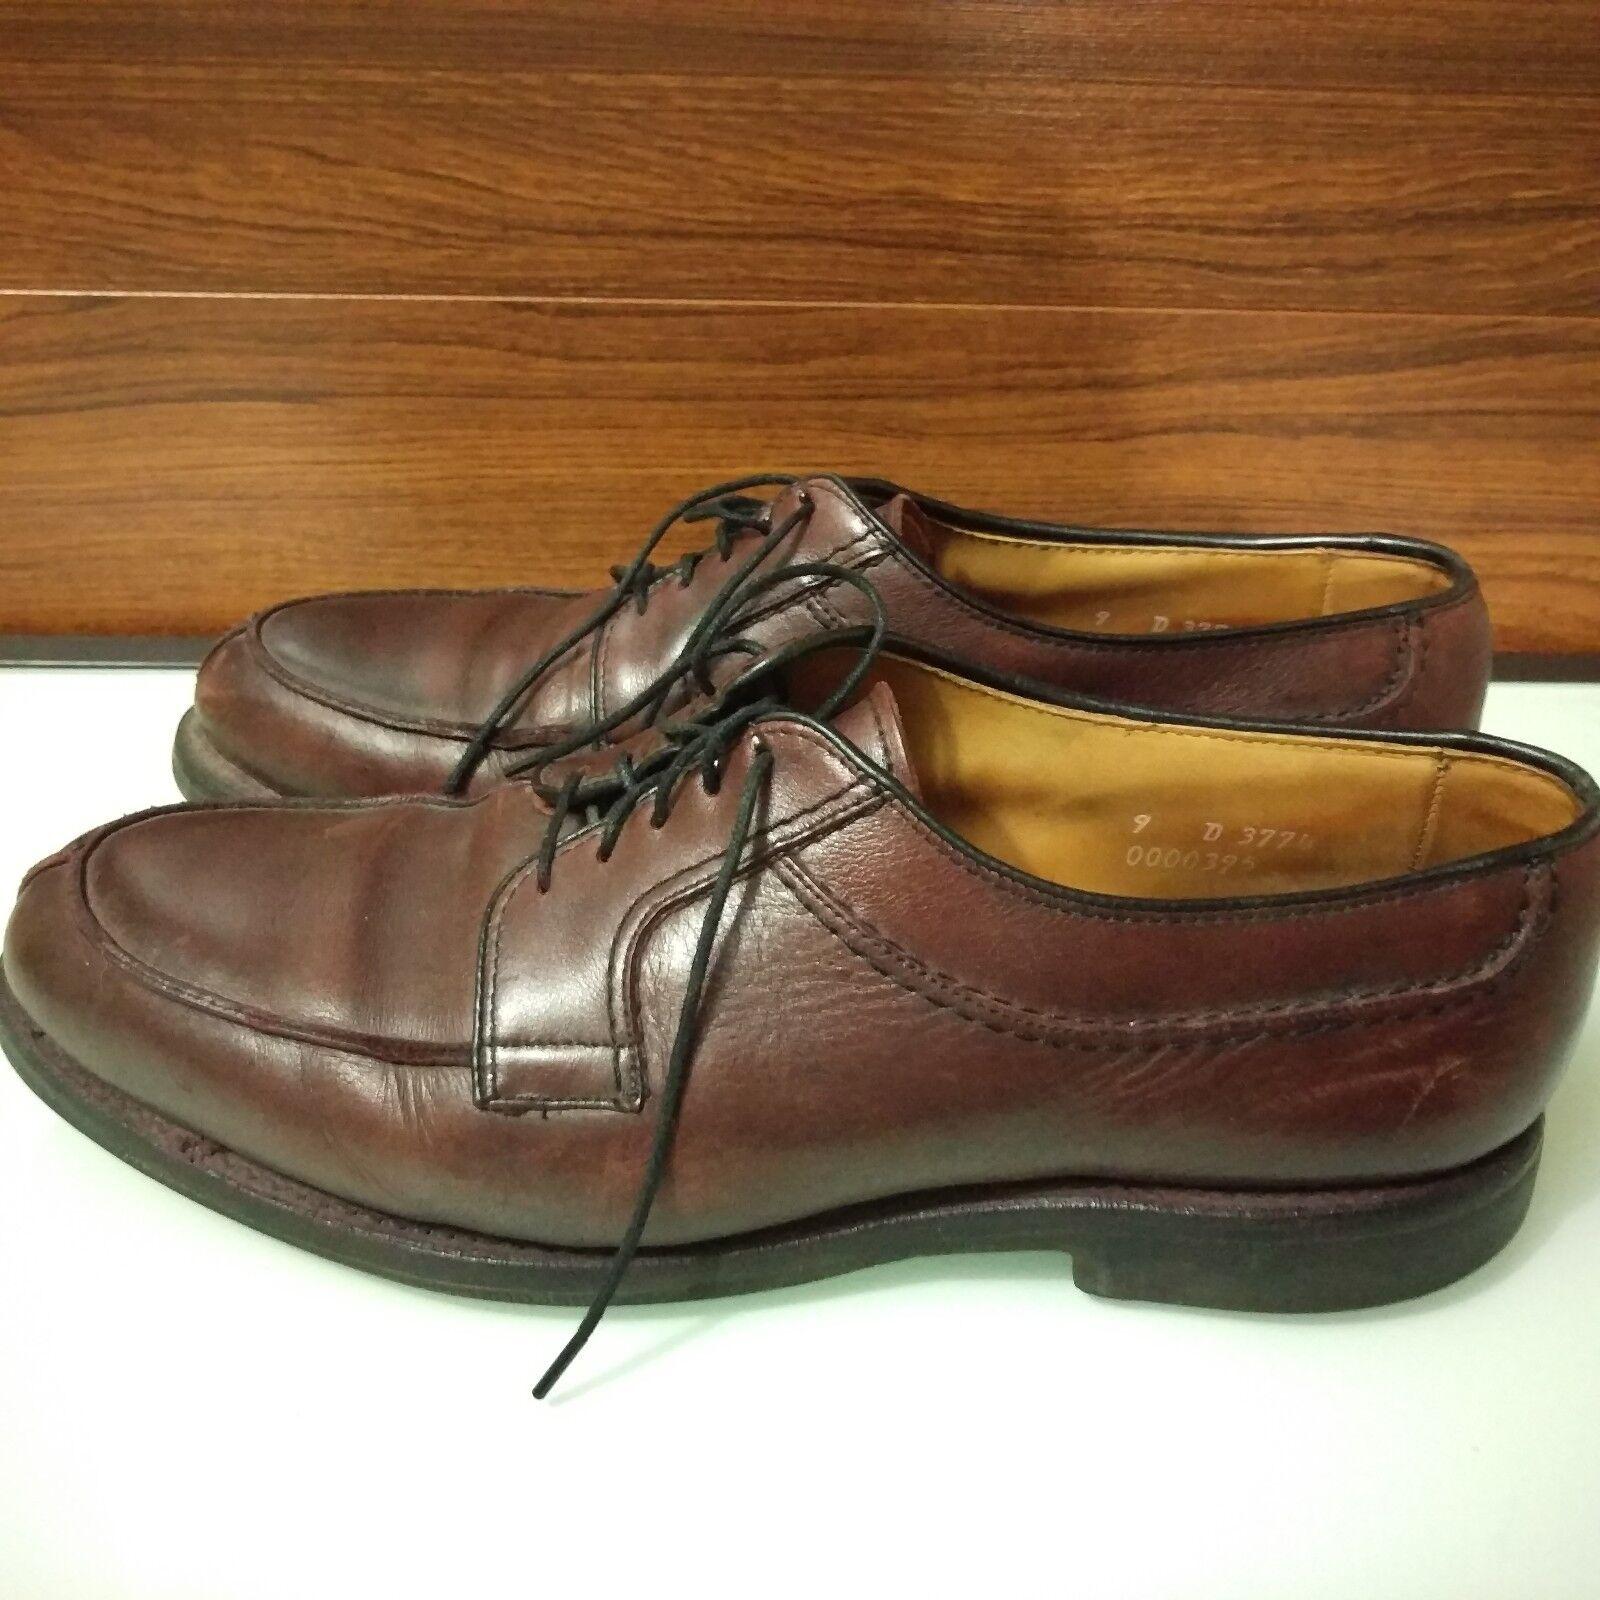 Allen Edmonds WILBERT Oxfords Men's shoes size 9 D Brown